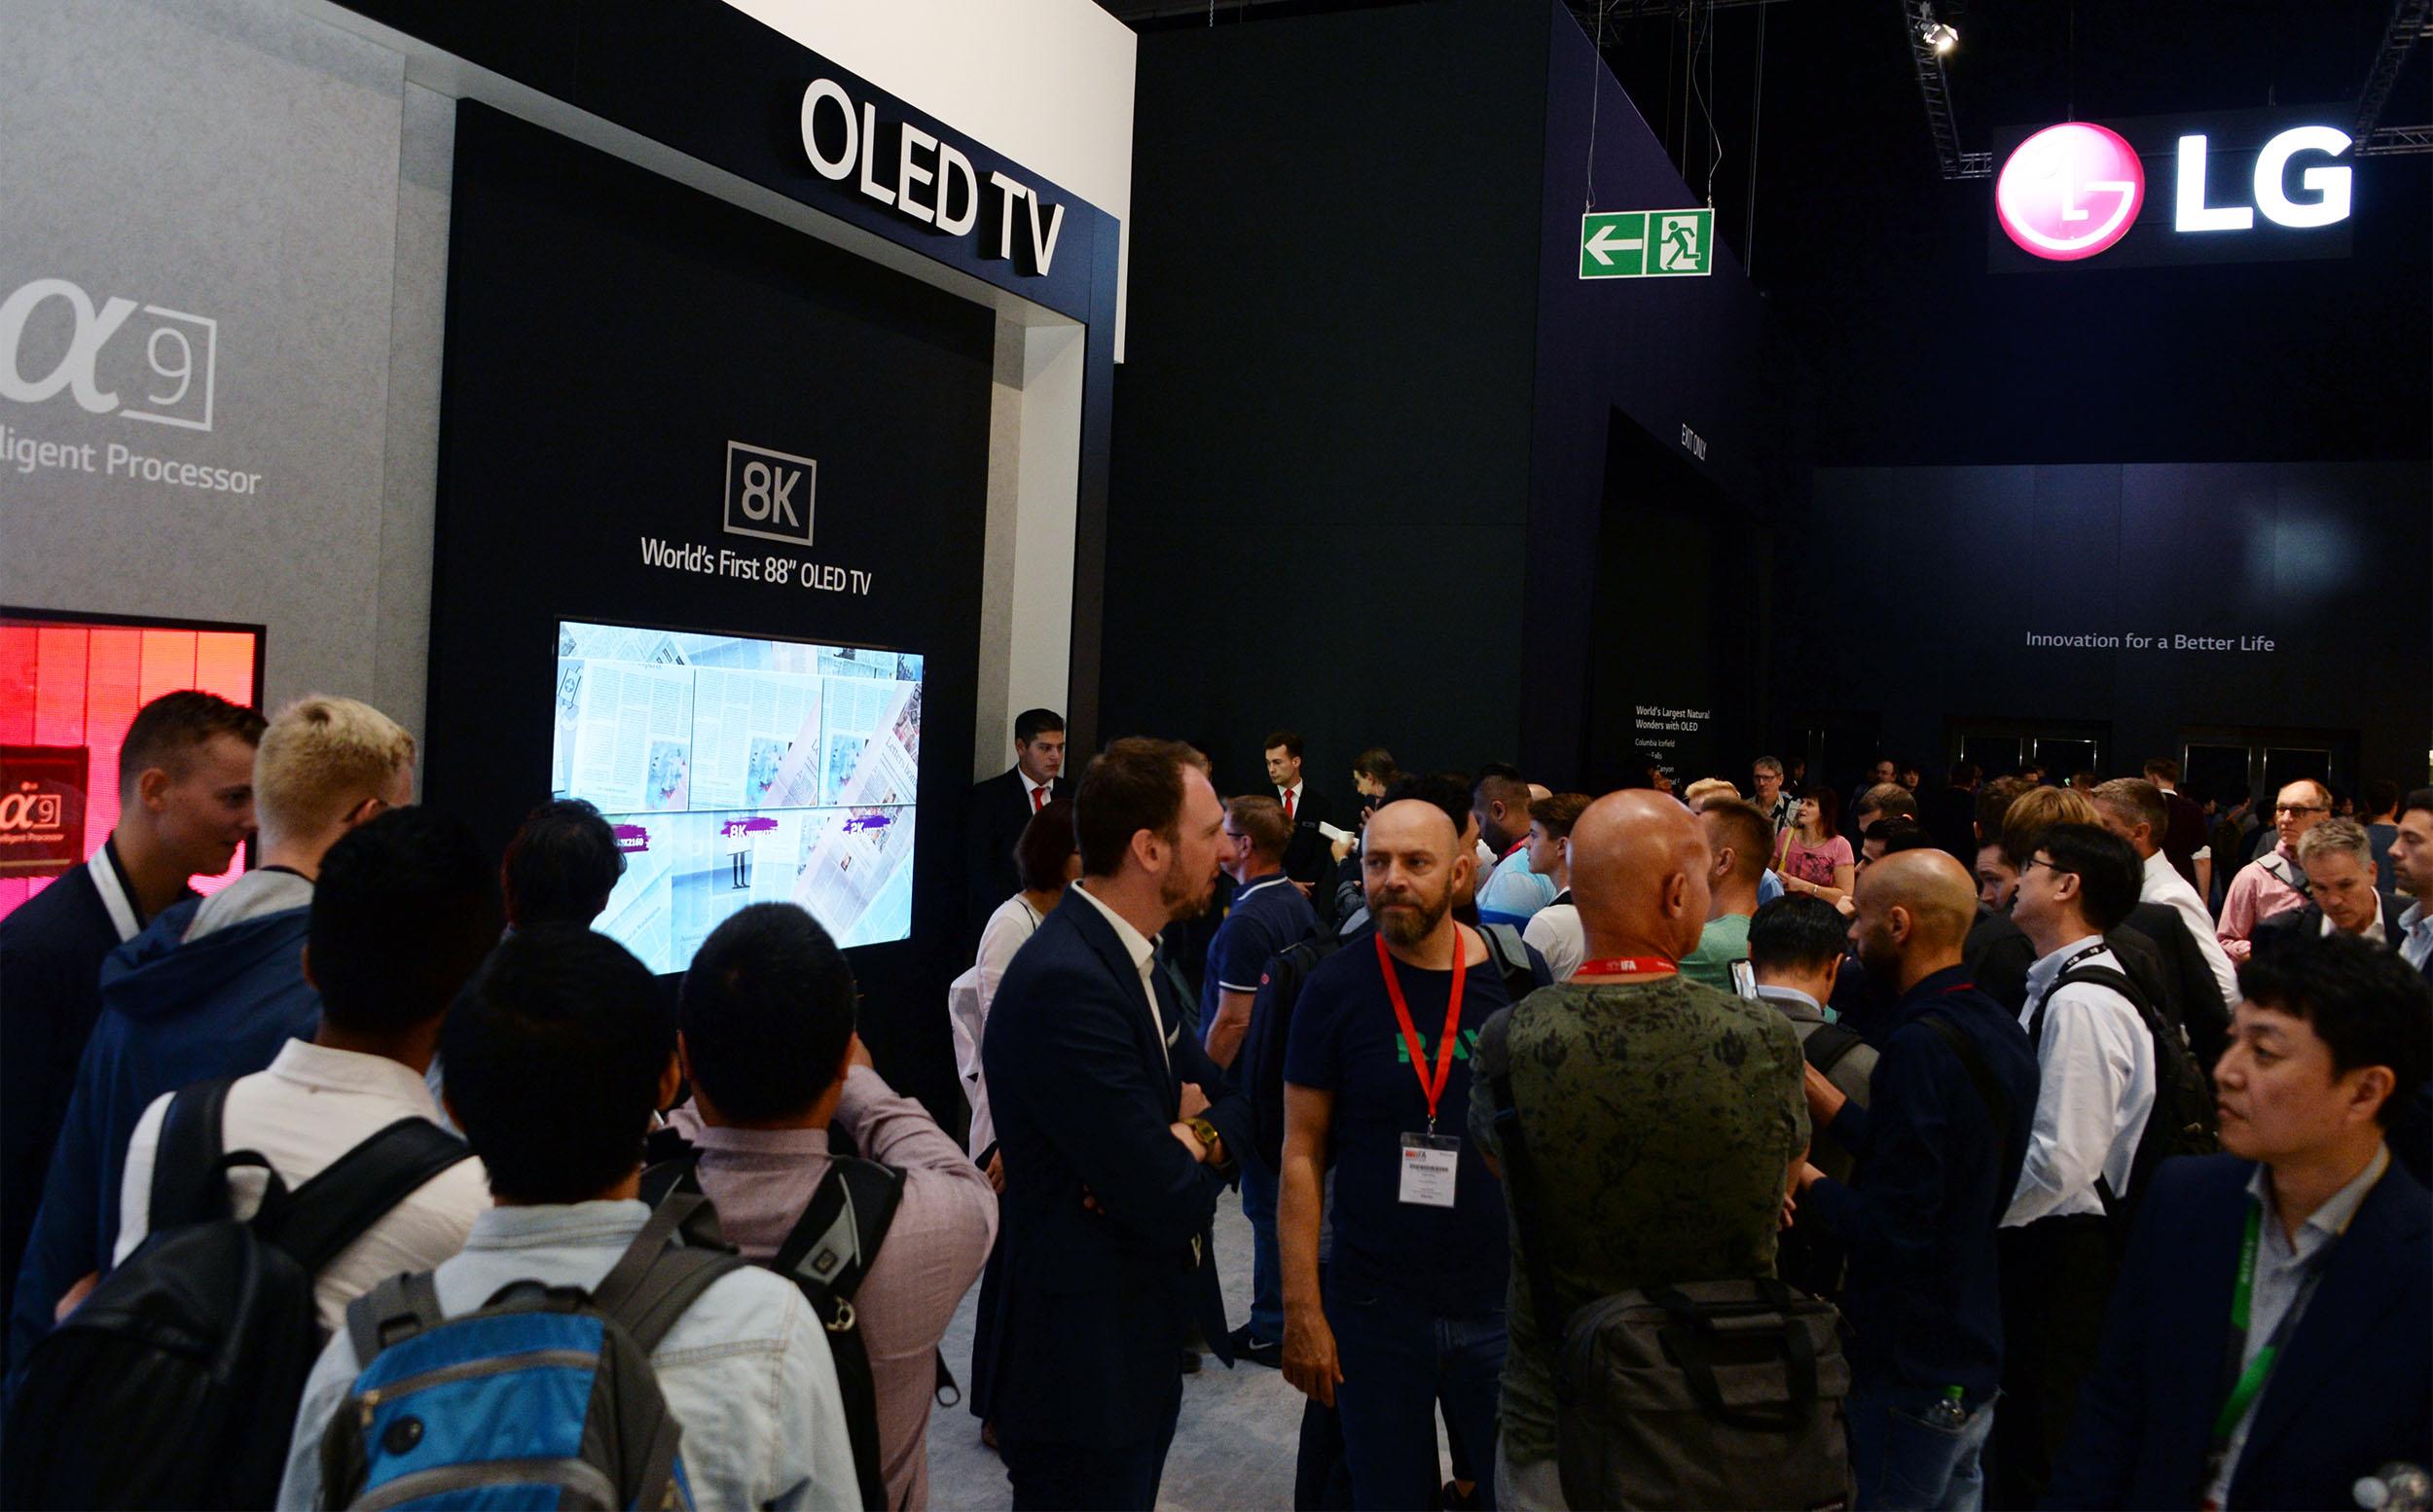 'LG 올레드 TV AI 씽큐'가 세계 비영리 소비자 매거진이 실시한 성능평가에서 1위를 독차지하고 있다. 최근 호주 '초이스'의 성능평가에서 1위를 차지한 것을 비롯해 올해 미국, 영국, 독일, 프랑스, 이탈리아, 스페인, 네덜란드, 스웨덴 등 9개 국가에서 1위를 차지하며 현존 최고 TV임을 입증하고 있다. 독일 베를린에서 열리고 있는 국제 가전박람회 'IFA 2018'에서 관람객들이 LG 올레드 TV AI 씽큐를 살펴보고 있다.